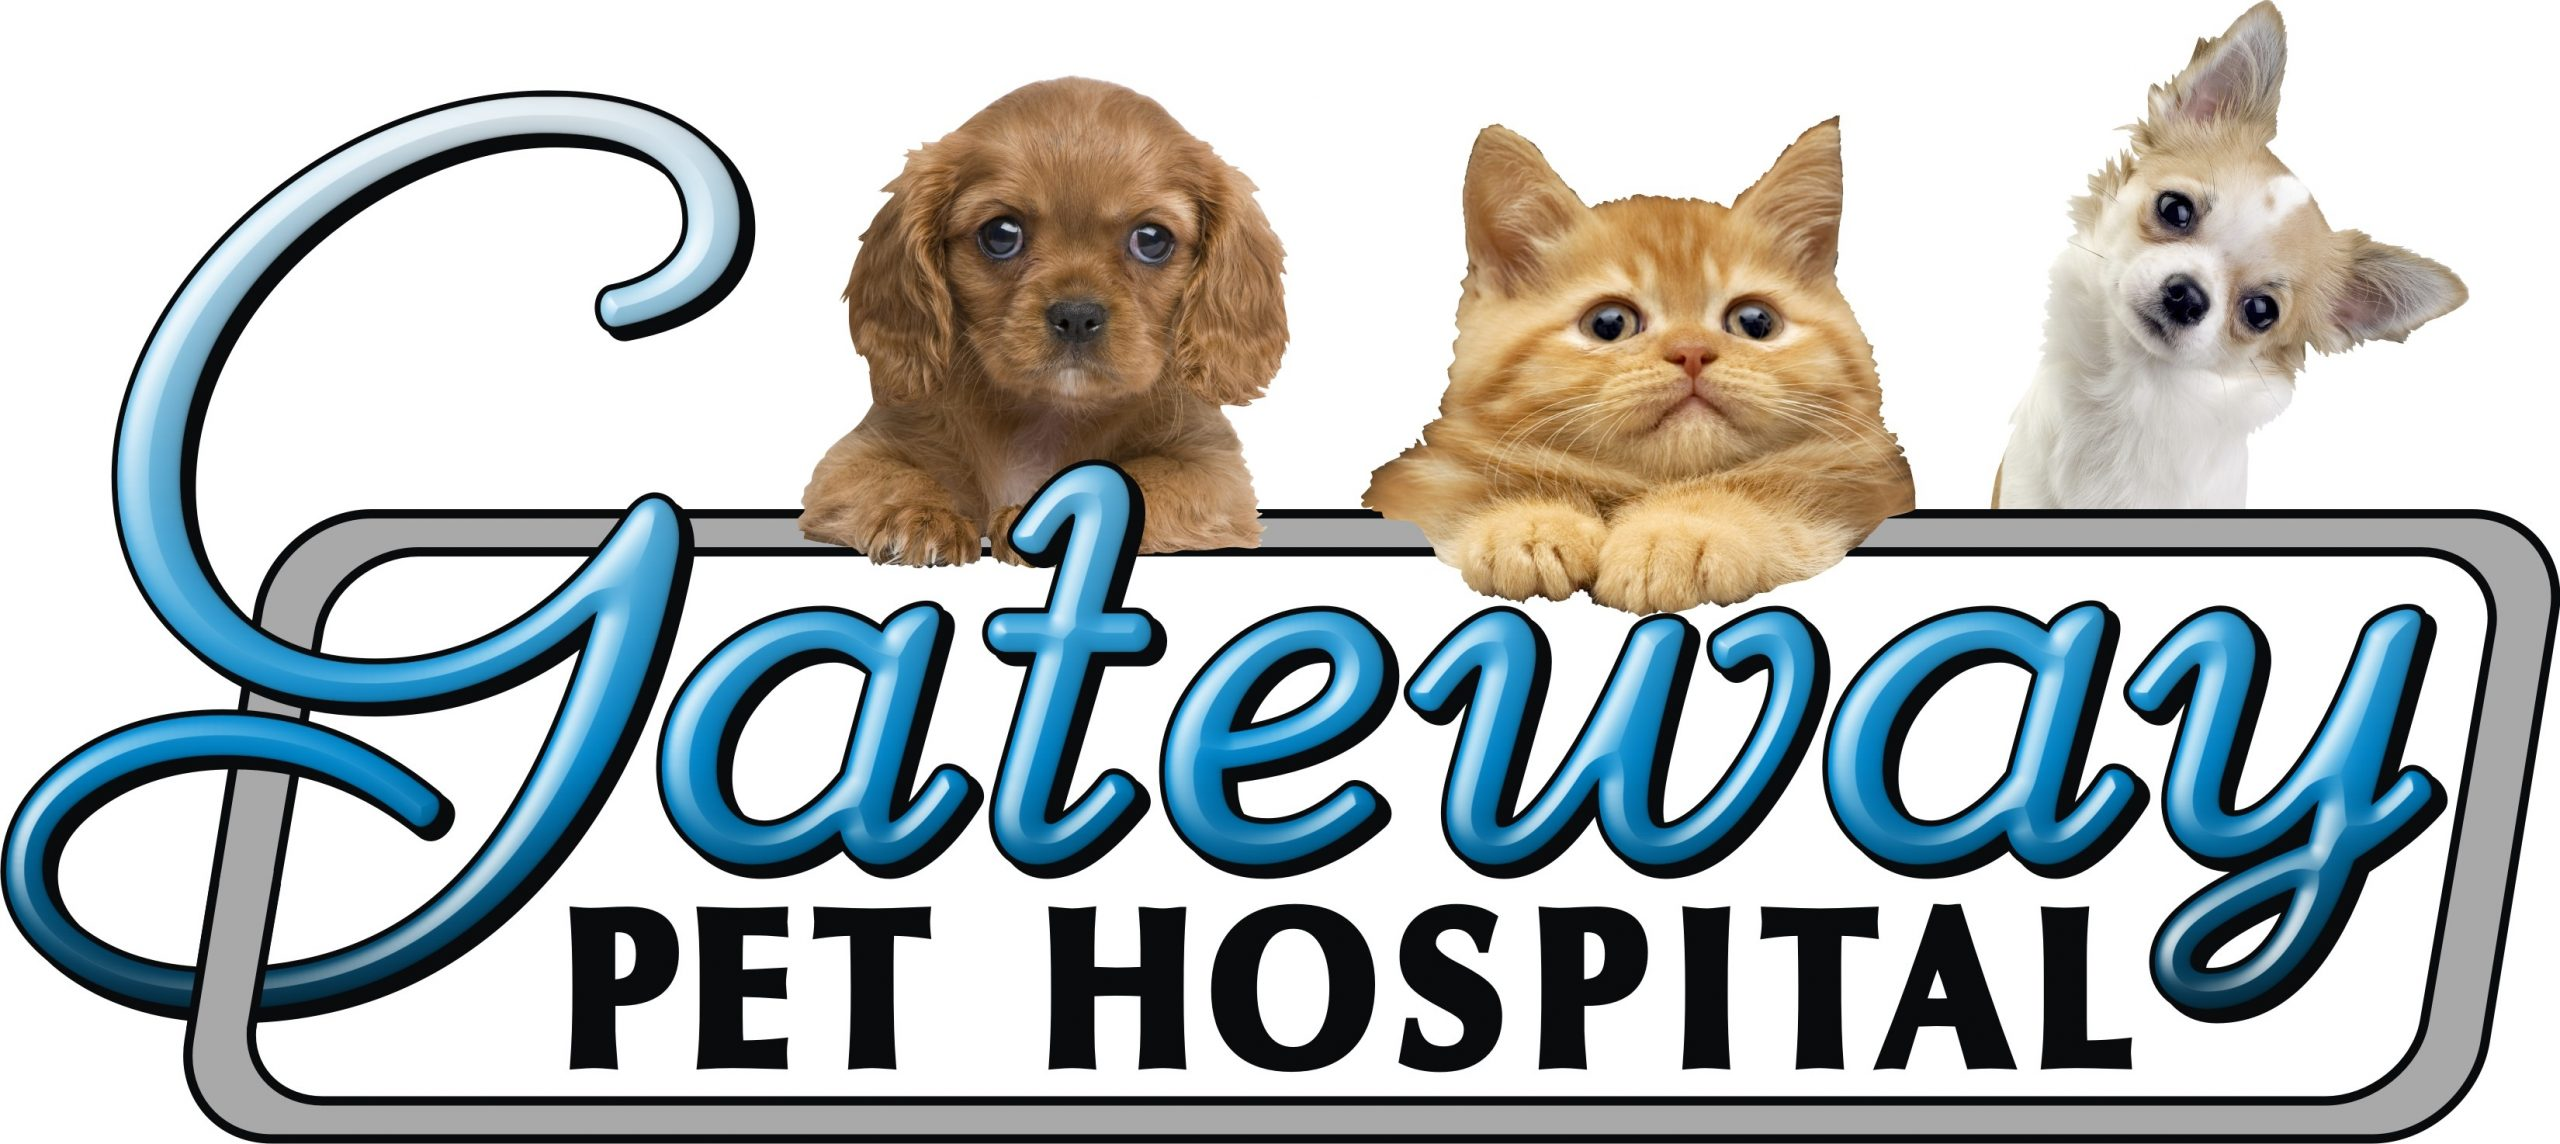 Gateway Pet Hospital